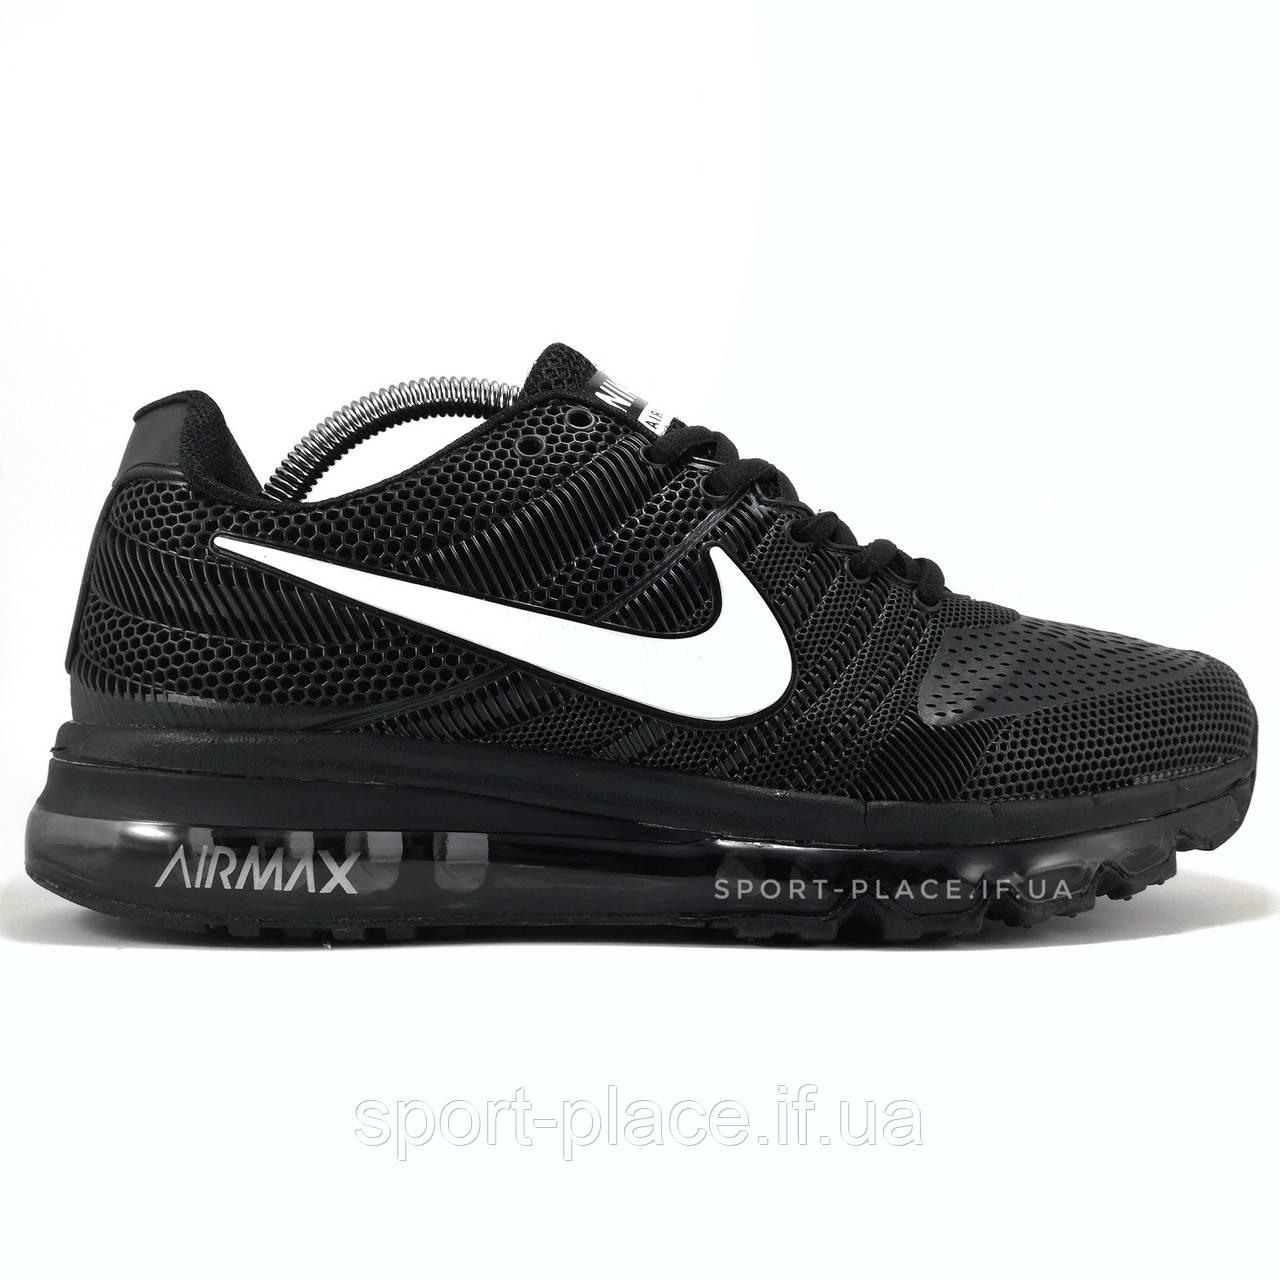 d3b8dffa Мужские кроссовки Nike Air Max 2017 black & white (лицензия) - Интернет  магазин одежды